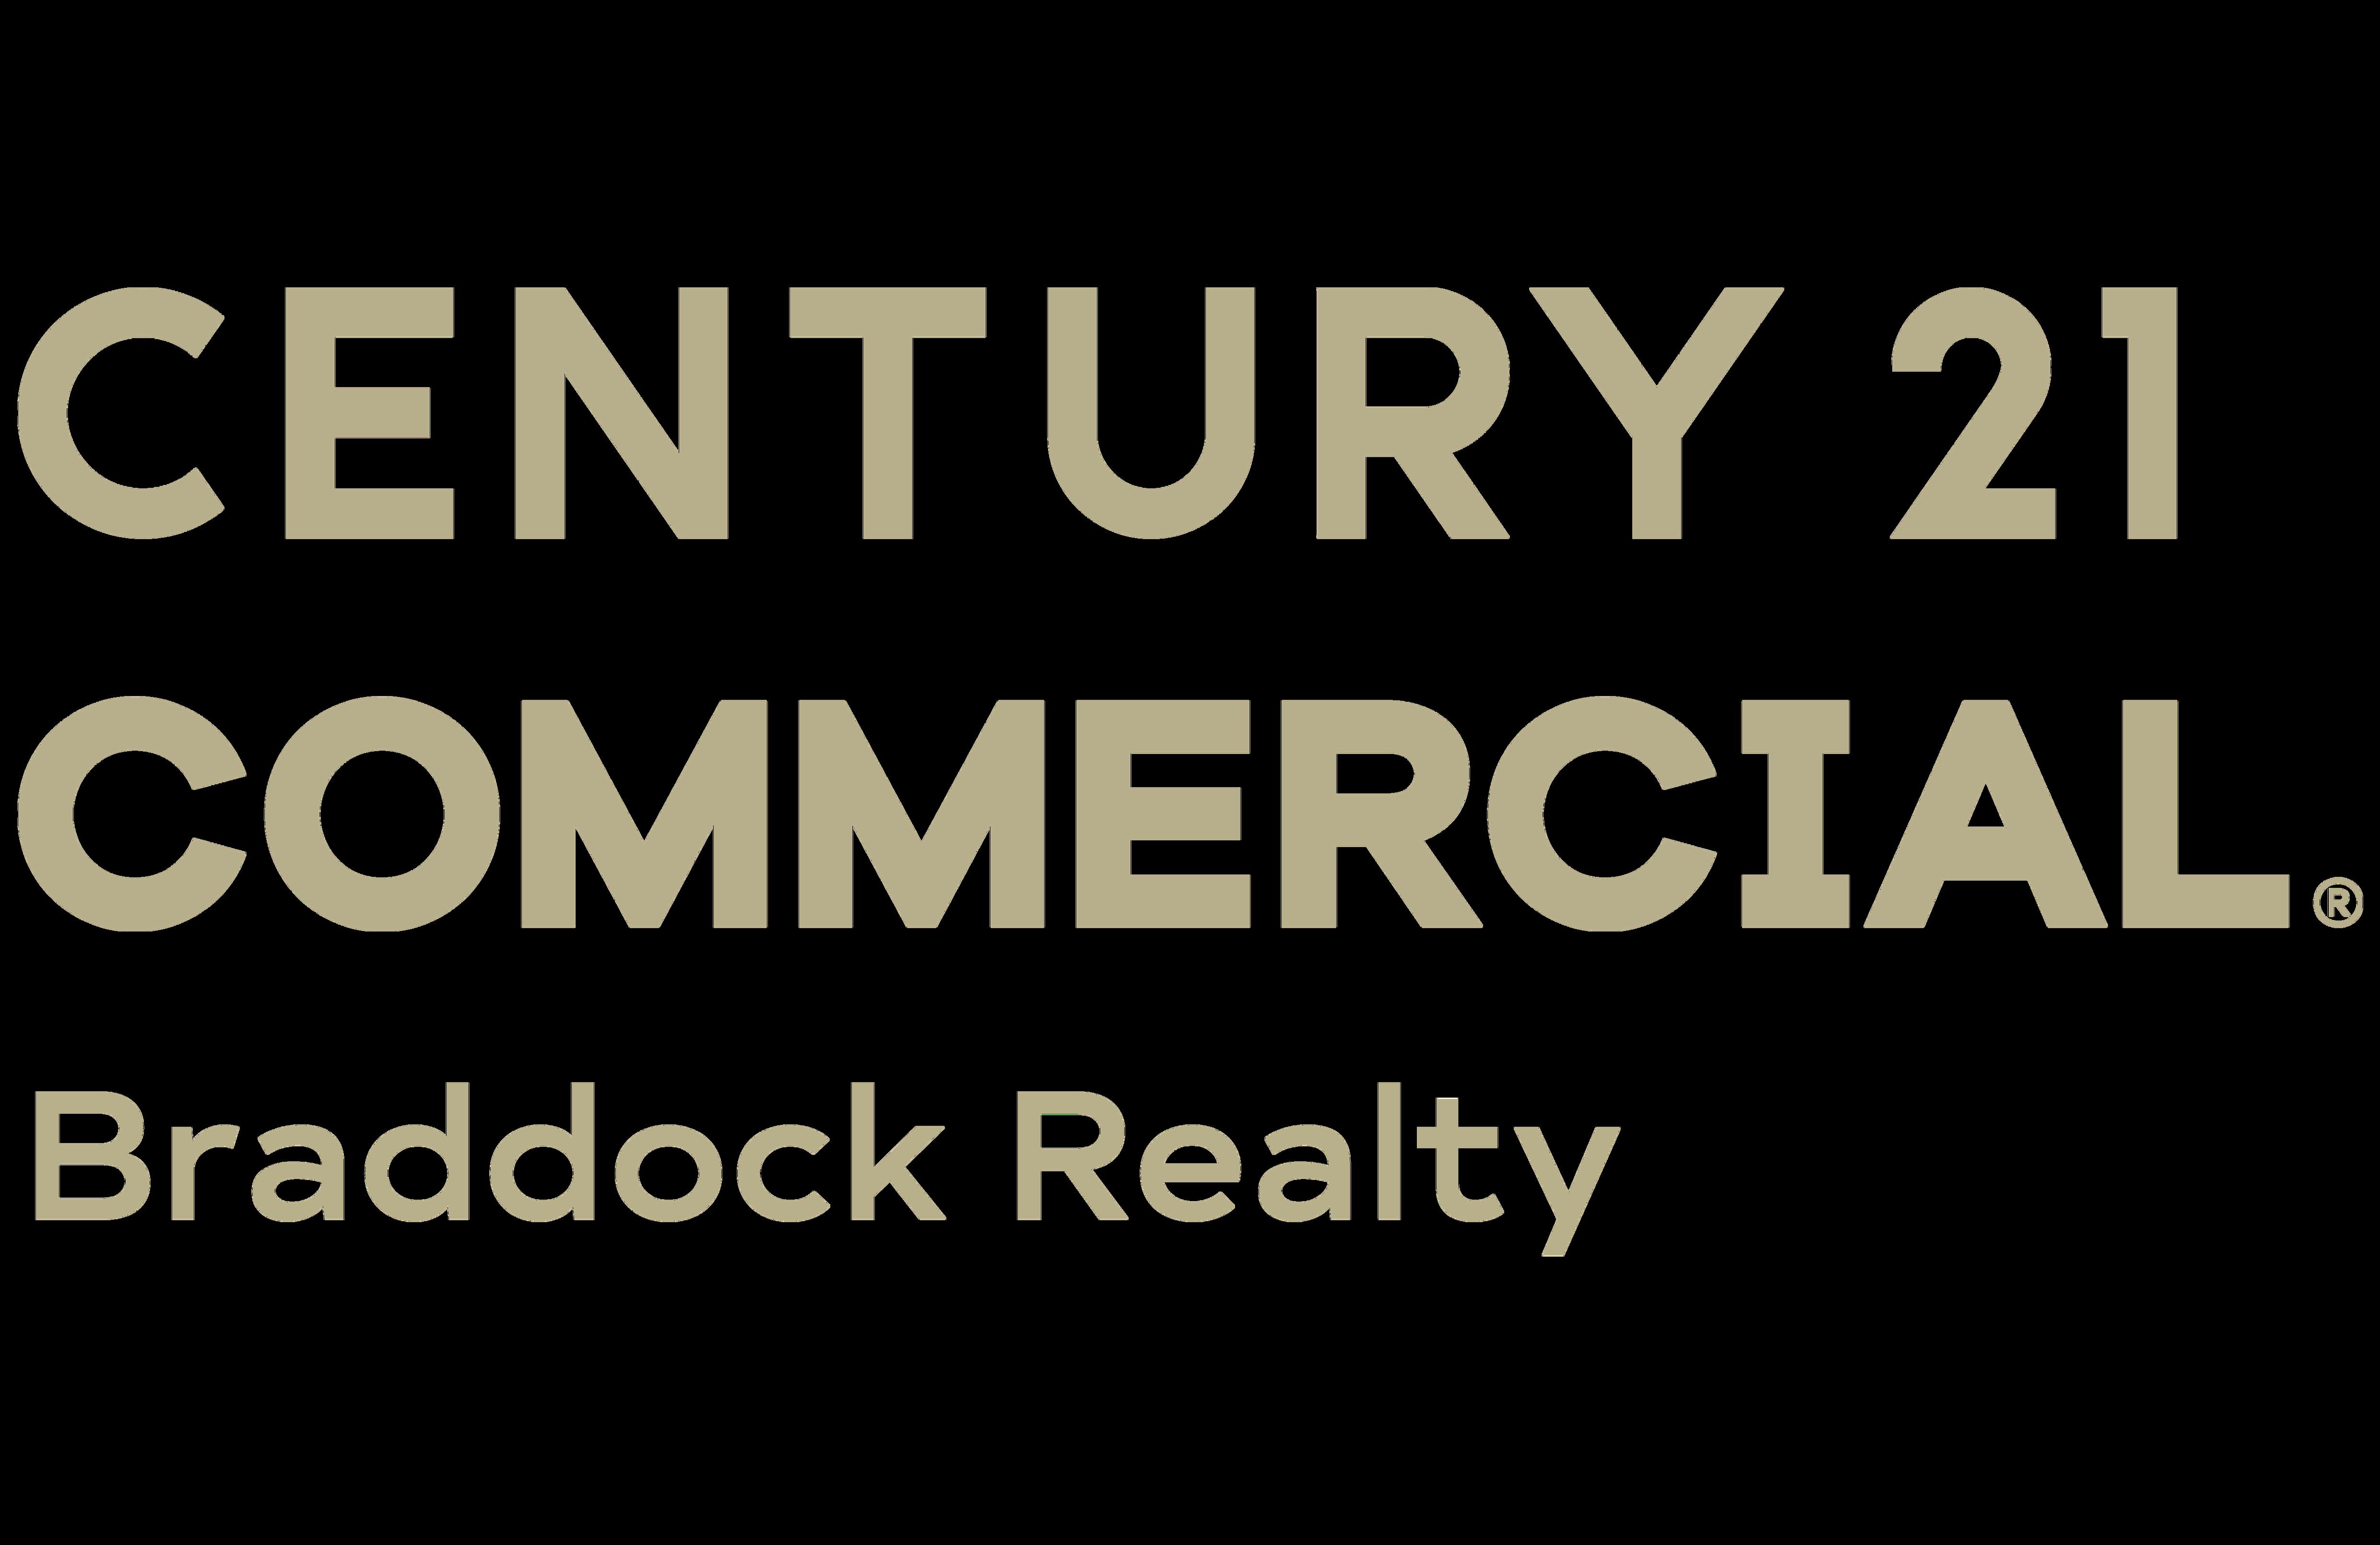 CENTURY 21 Braddock Realty